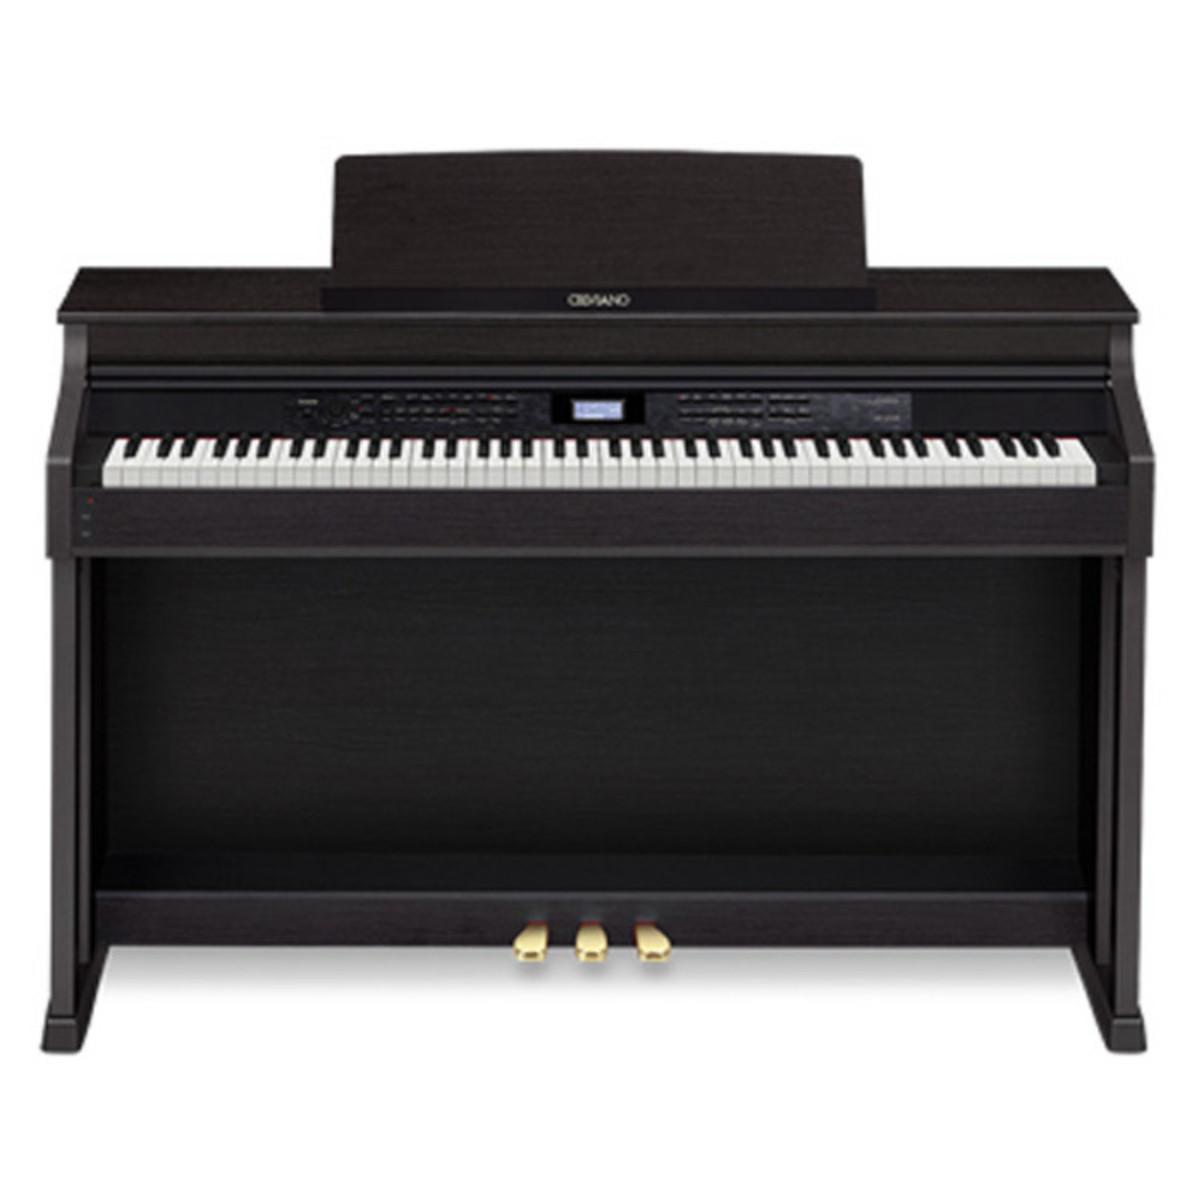 casio celviano ap 650 digital piano at gear4music. Black Bedroom Furniture Sets. Home Design Ideas